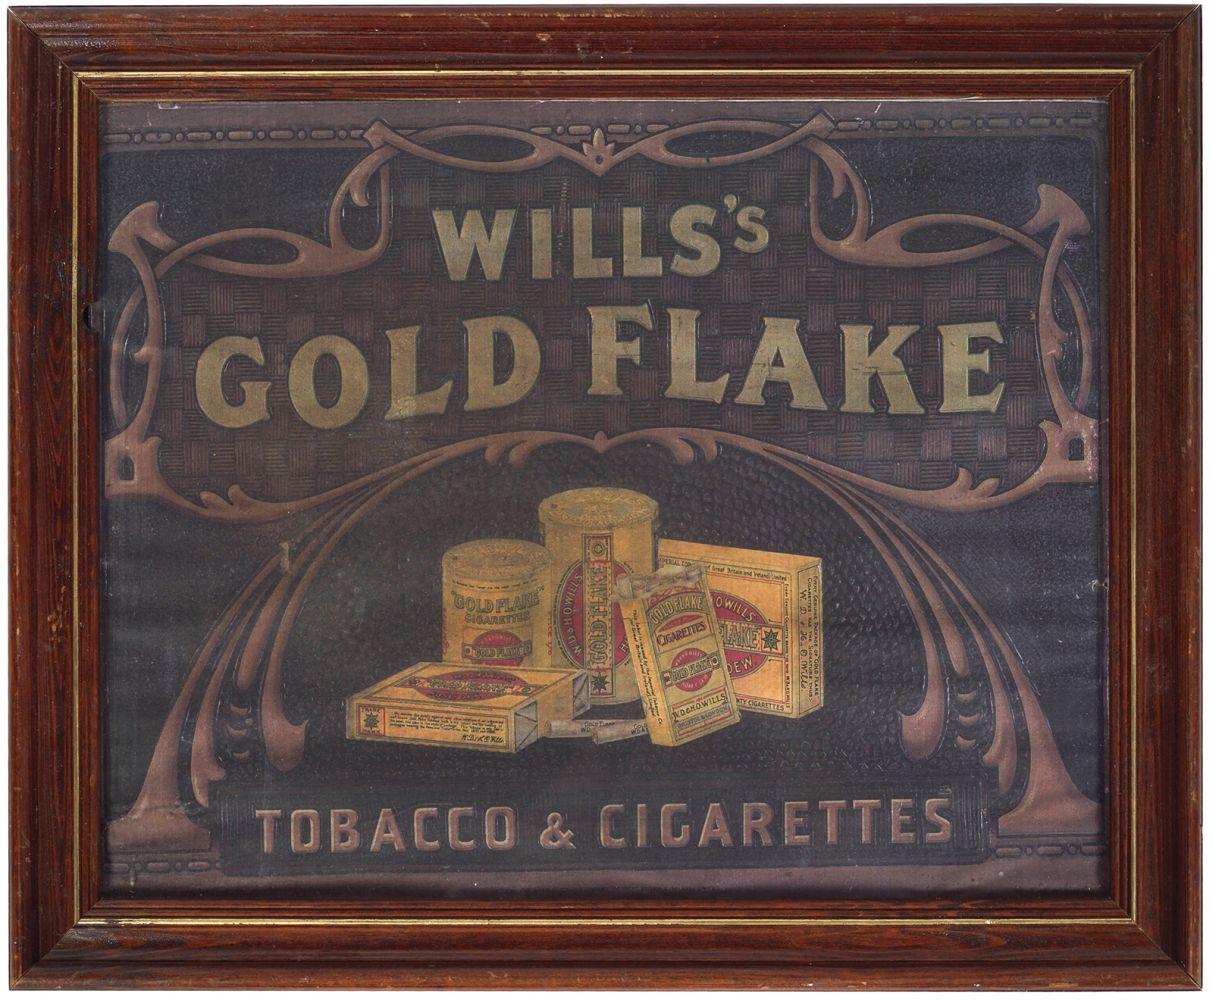 WILLS'S GOLD FLAKE TOBACCO ORIGINAL POSTER